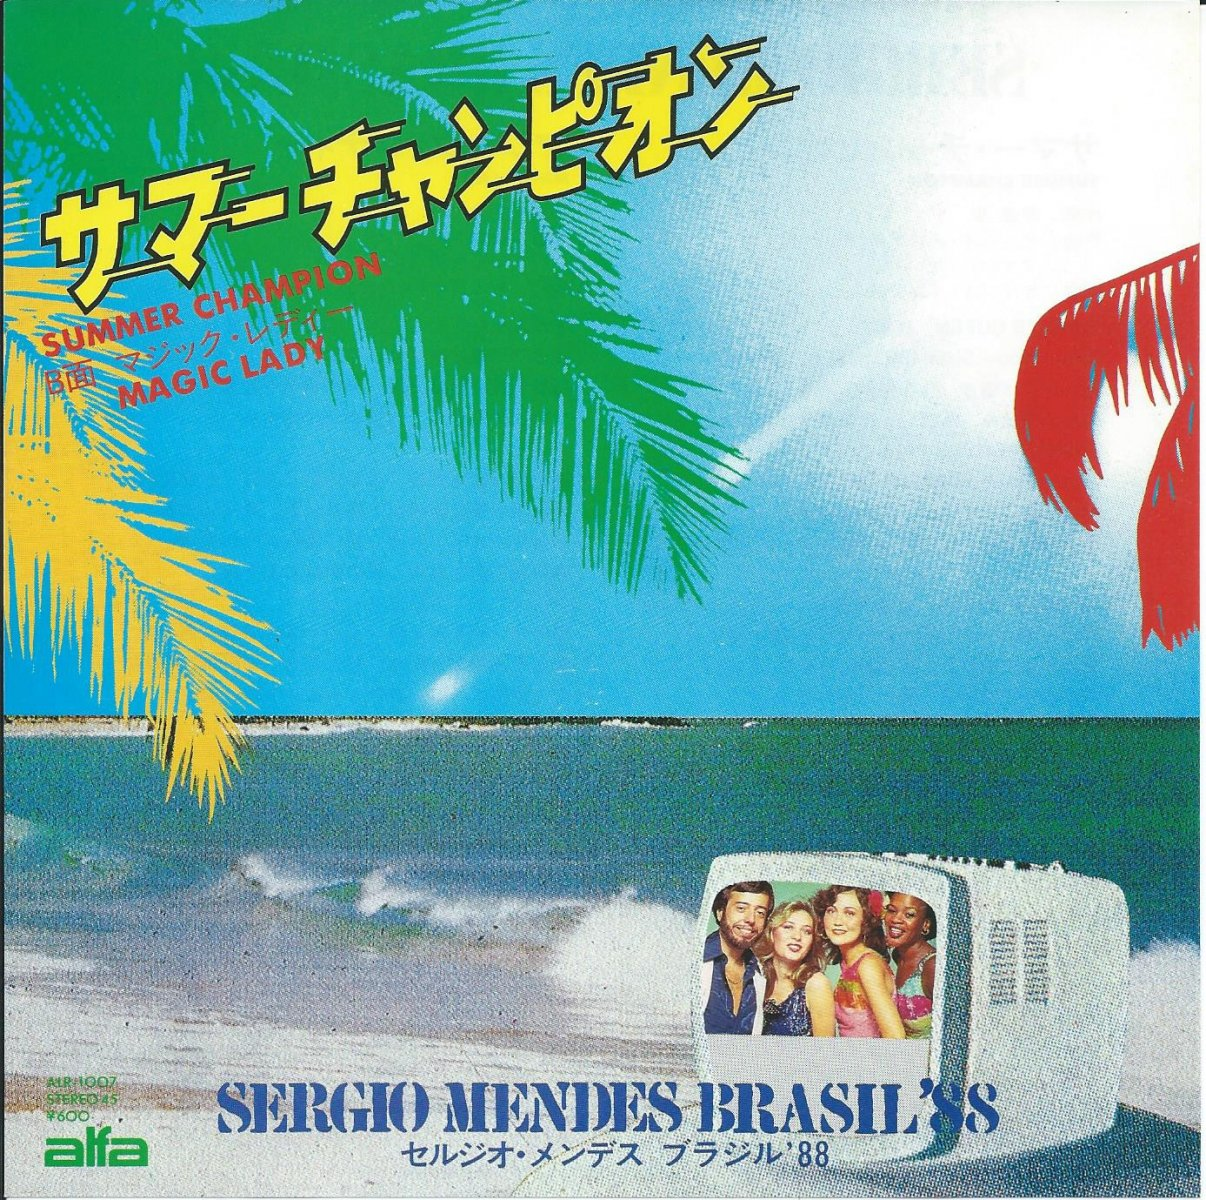 SERGIO MENDES BRASIL'88 セルジオ・メンデス ブラジル'88 / SUMMER CHAMPION サマー・チャンピオン (7